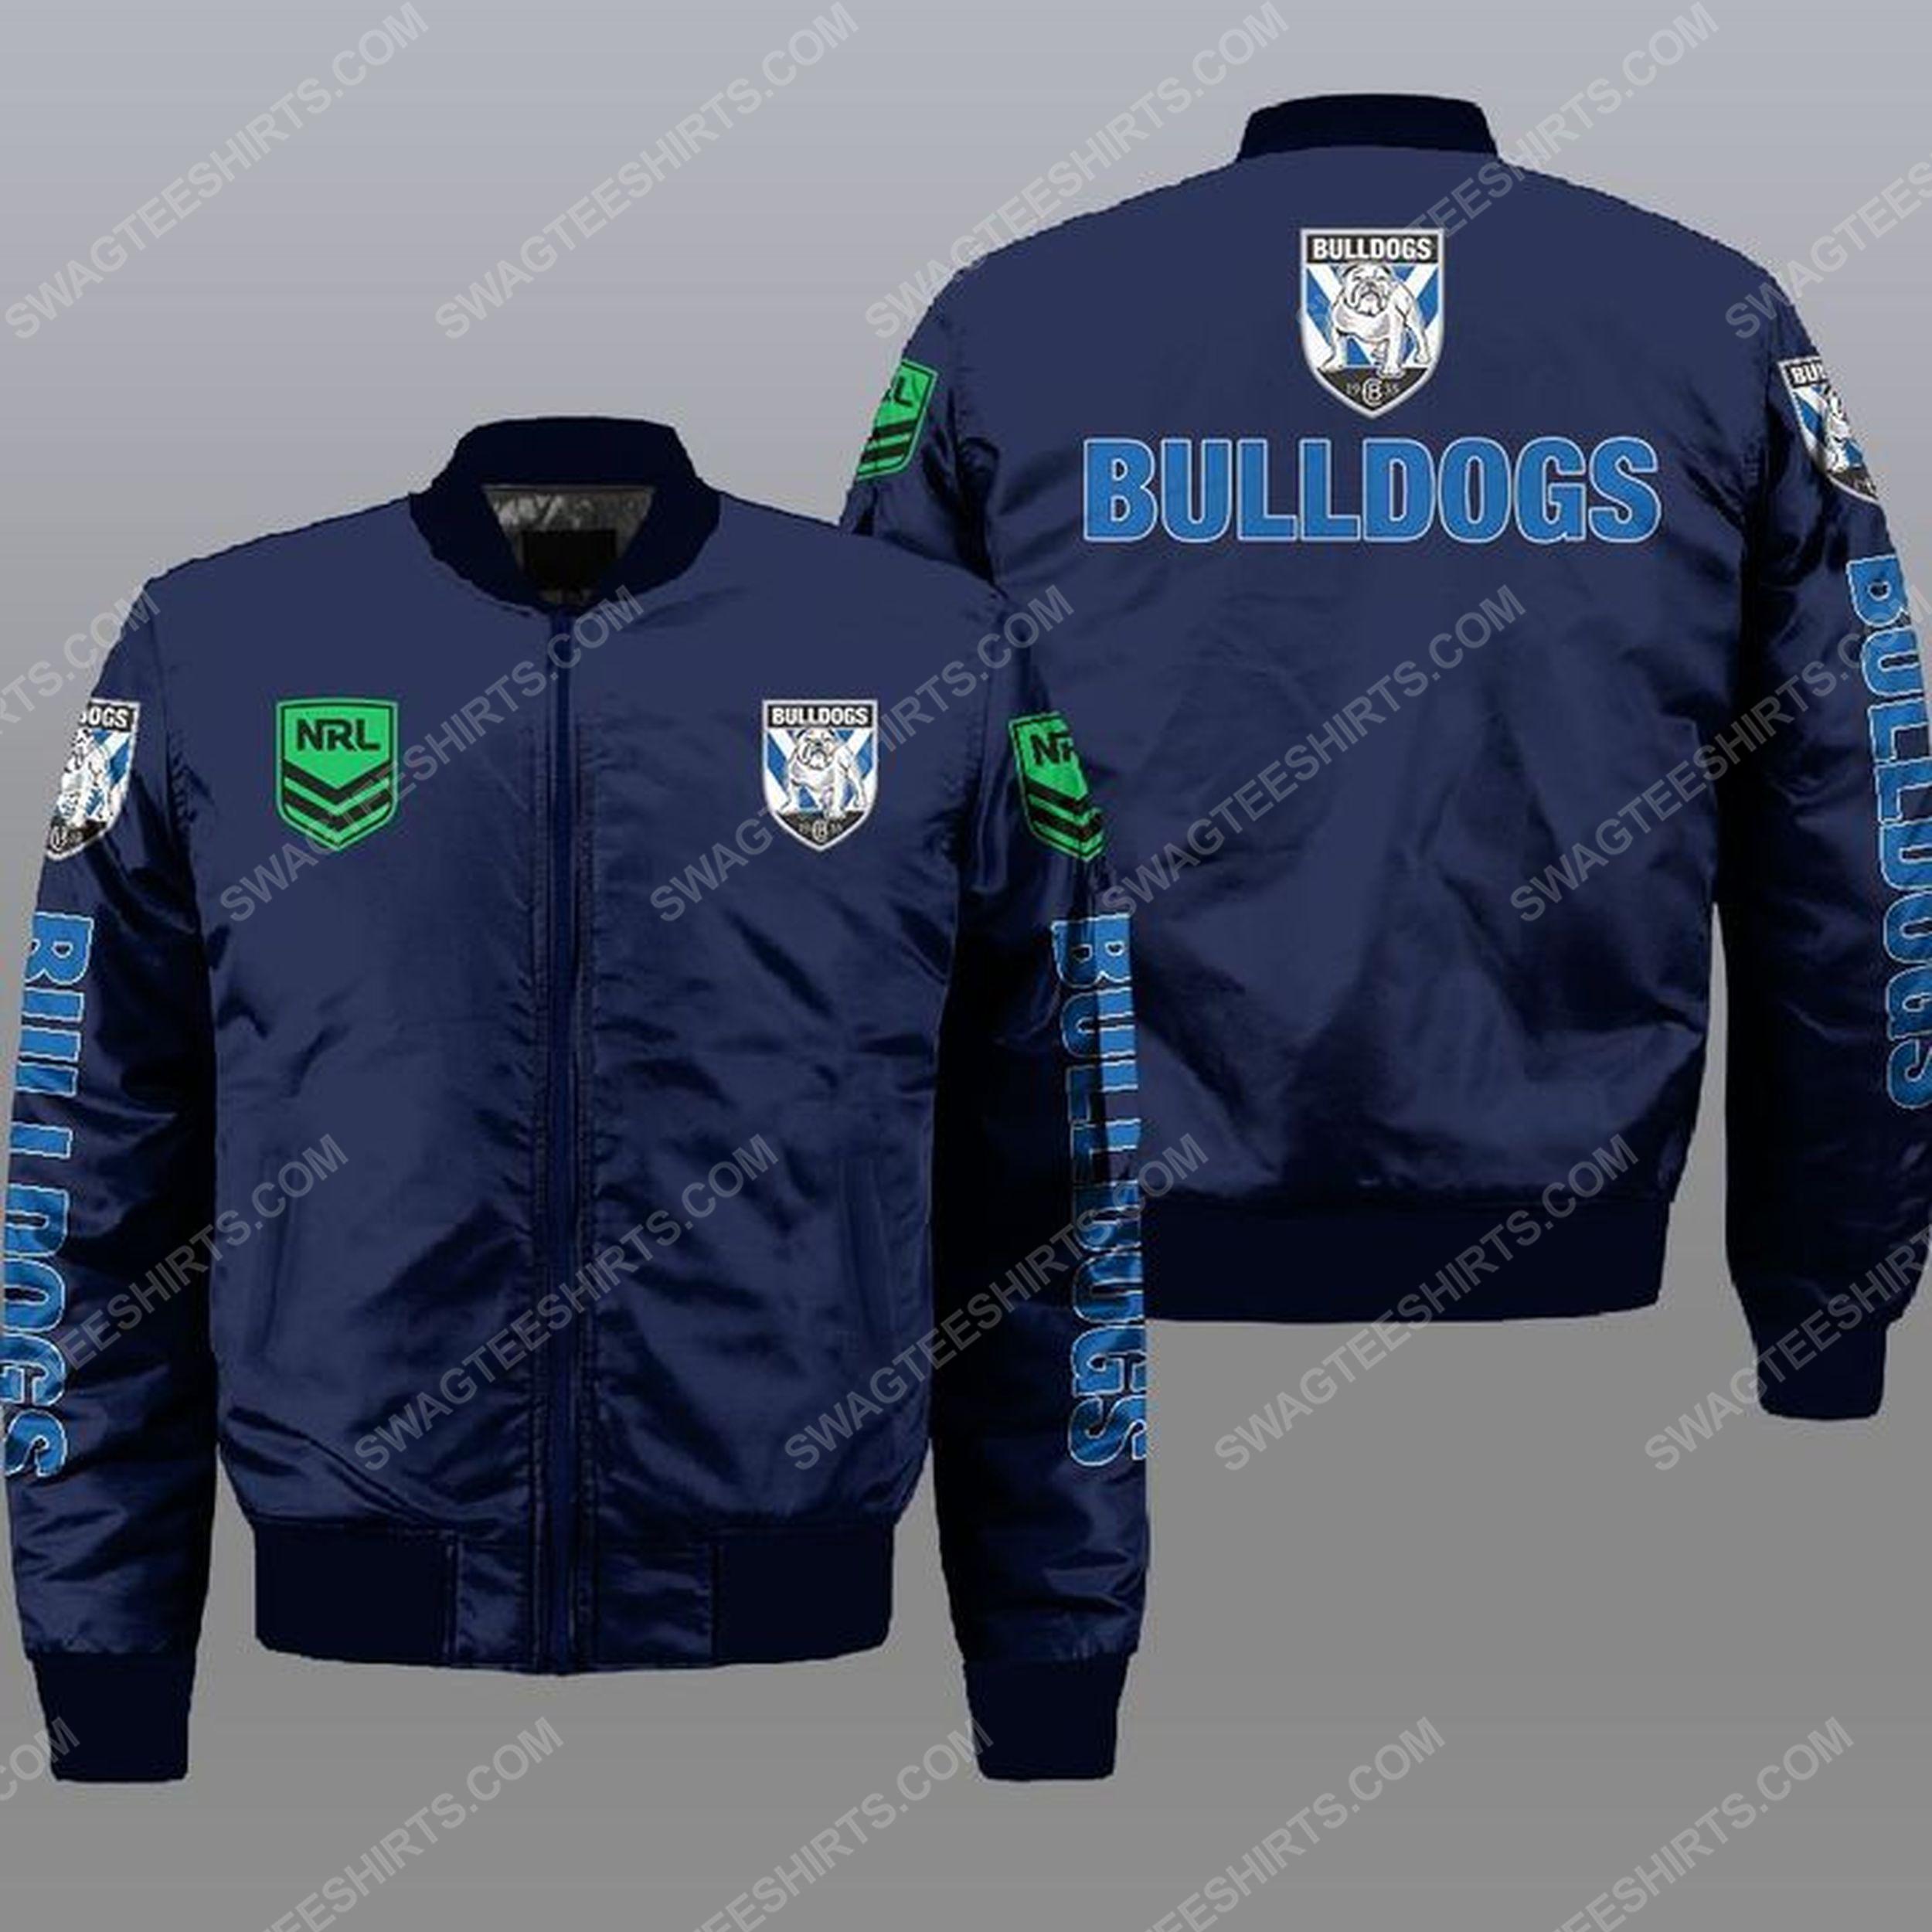 Canterbury-bankstown bulldogs all over print bomber jacket -navy 1